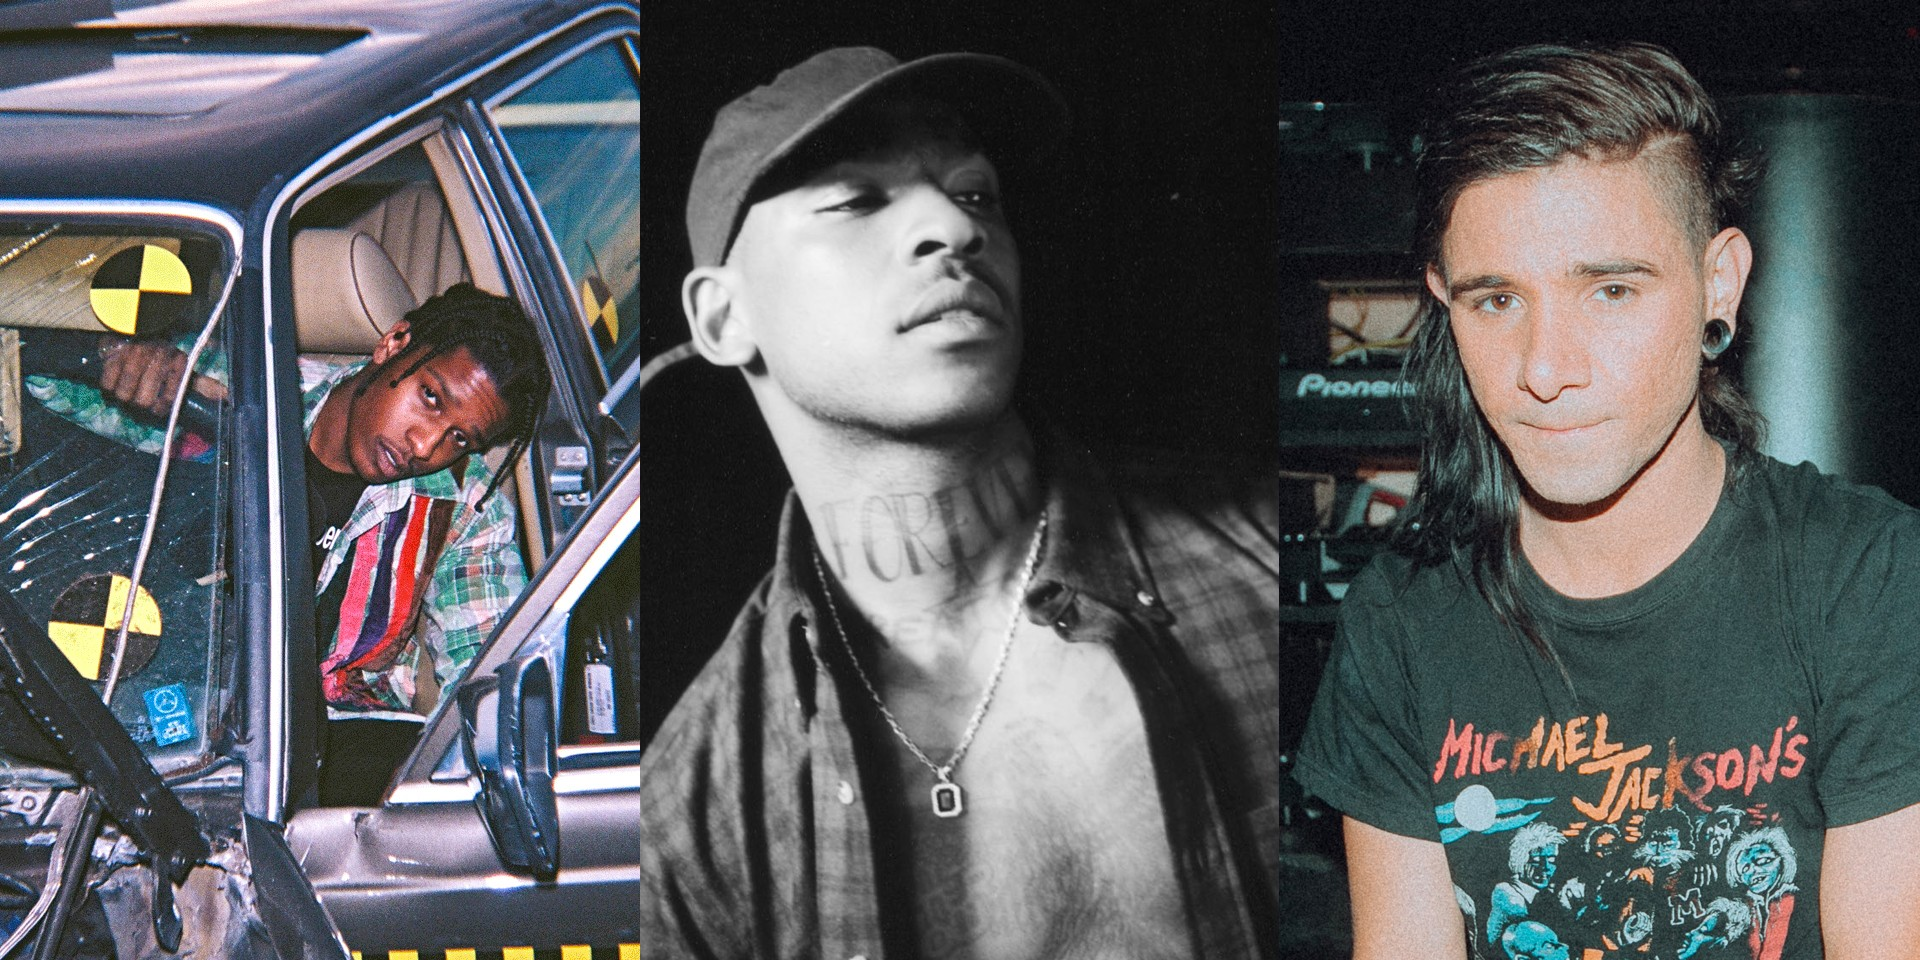 A$AP Rocky, Brockhampton, Skepta, Skrillex and more confirmed for Australia's Listen Out festival